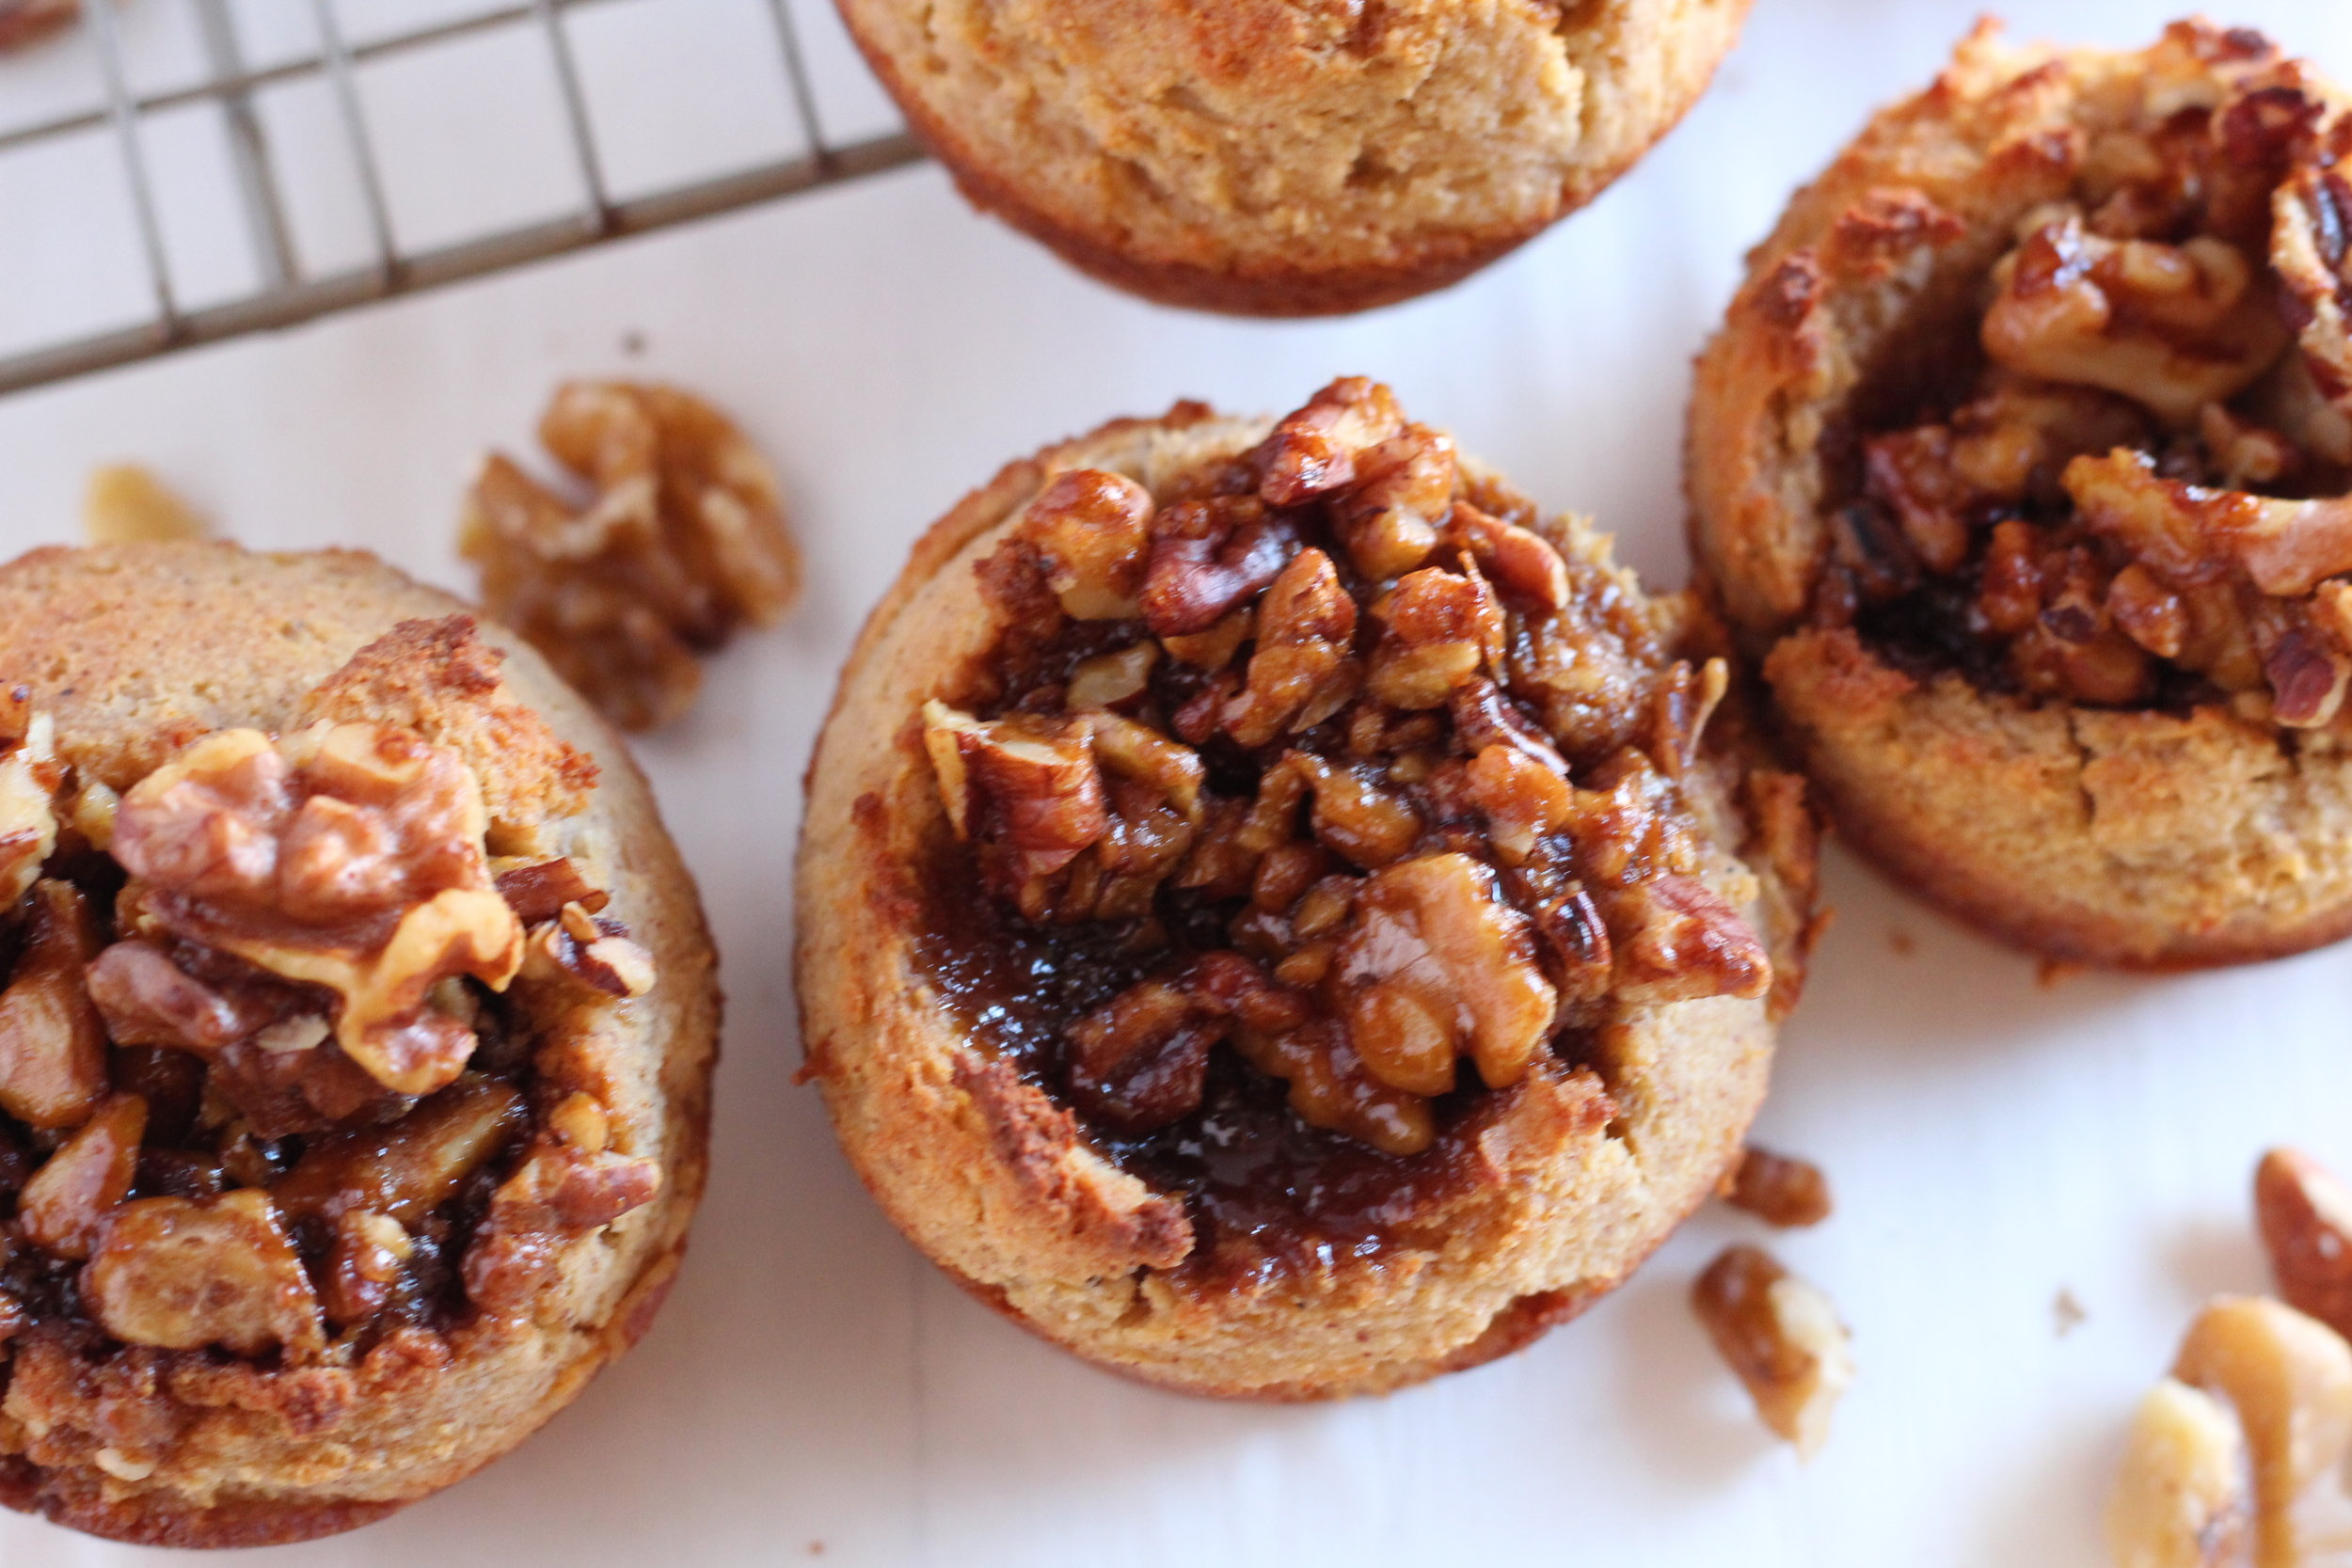 Grain Free Banana Muffins with Walnut Pecan Topping